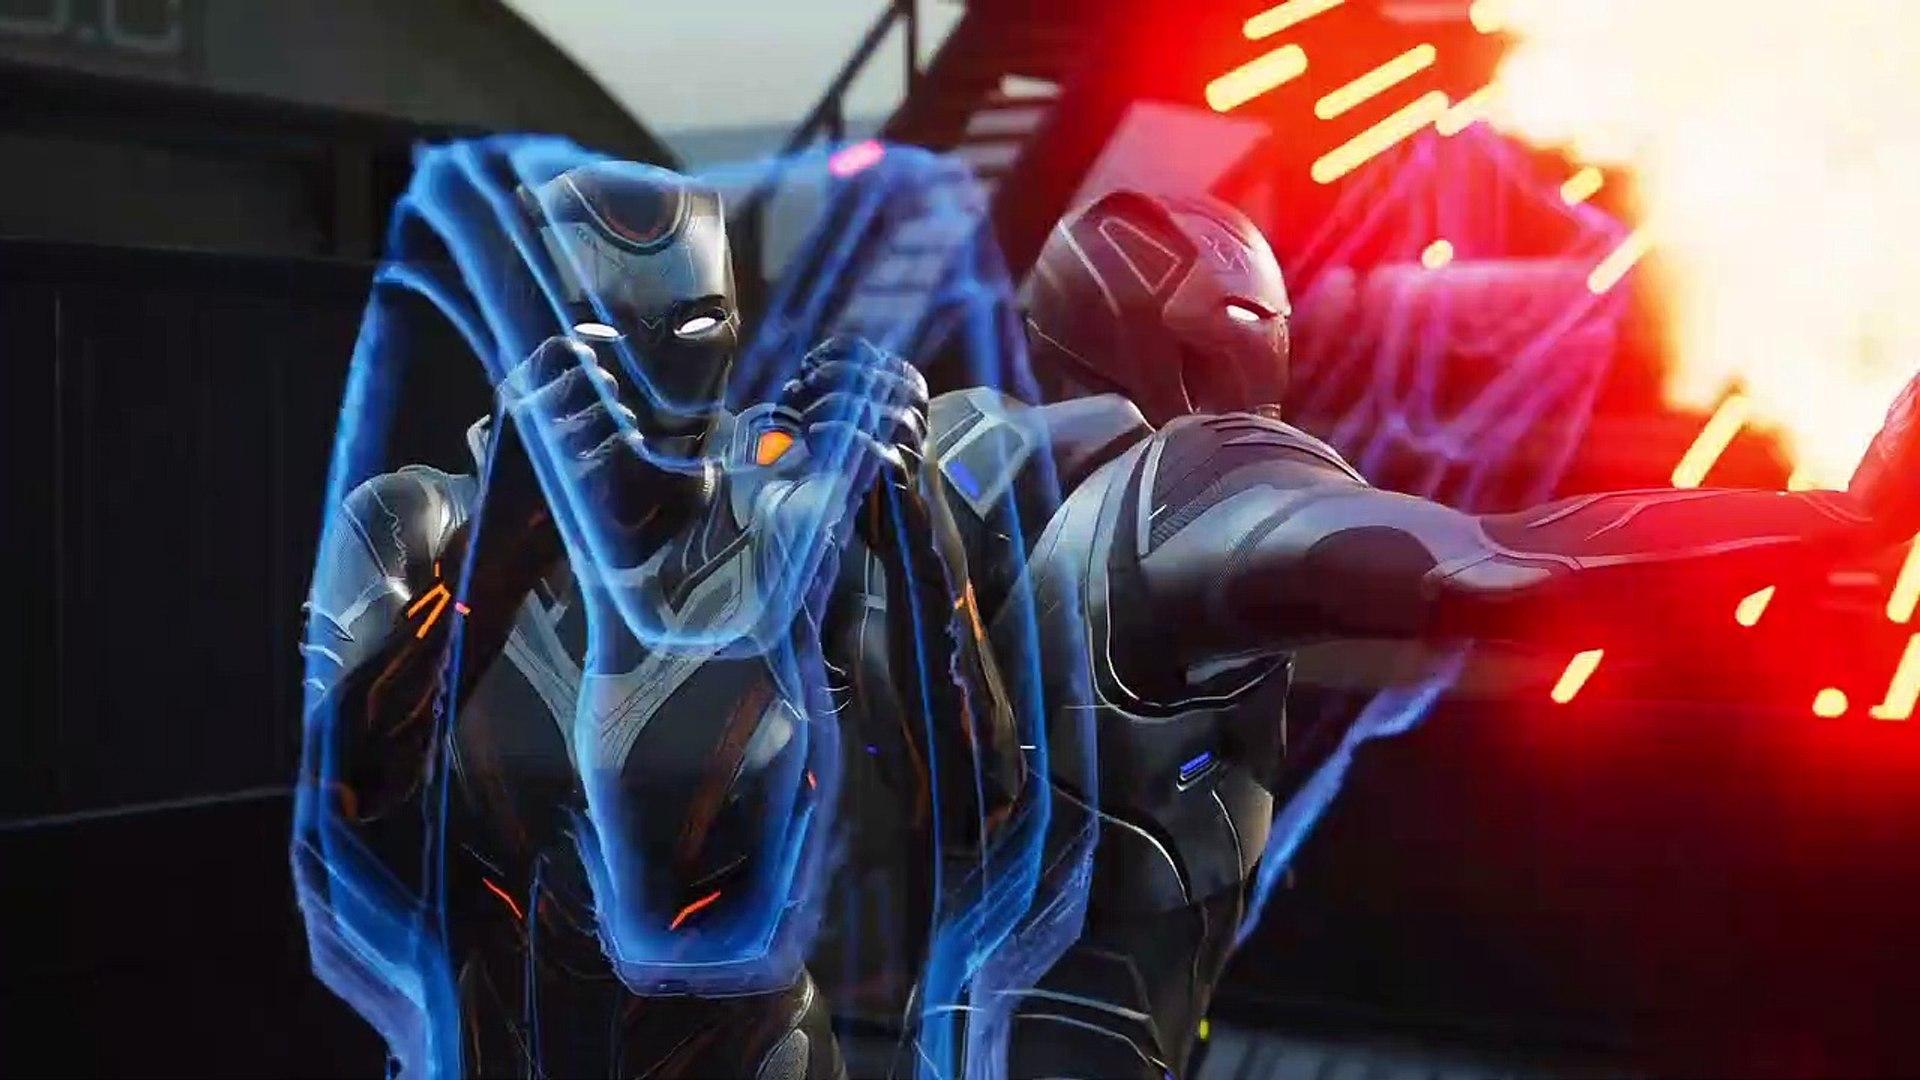 Avengers - Damage Control (Official Story Trailer) | Marvel Studios | Flixaap